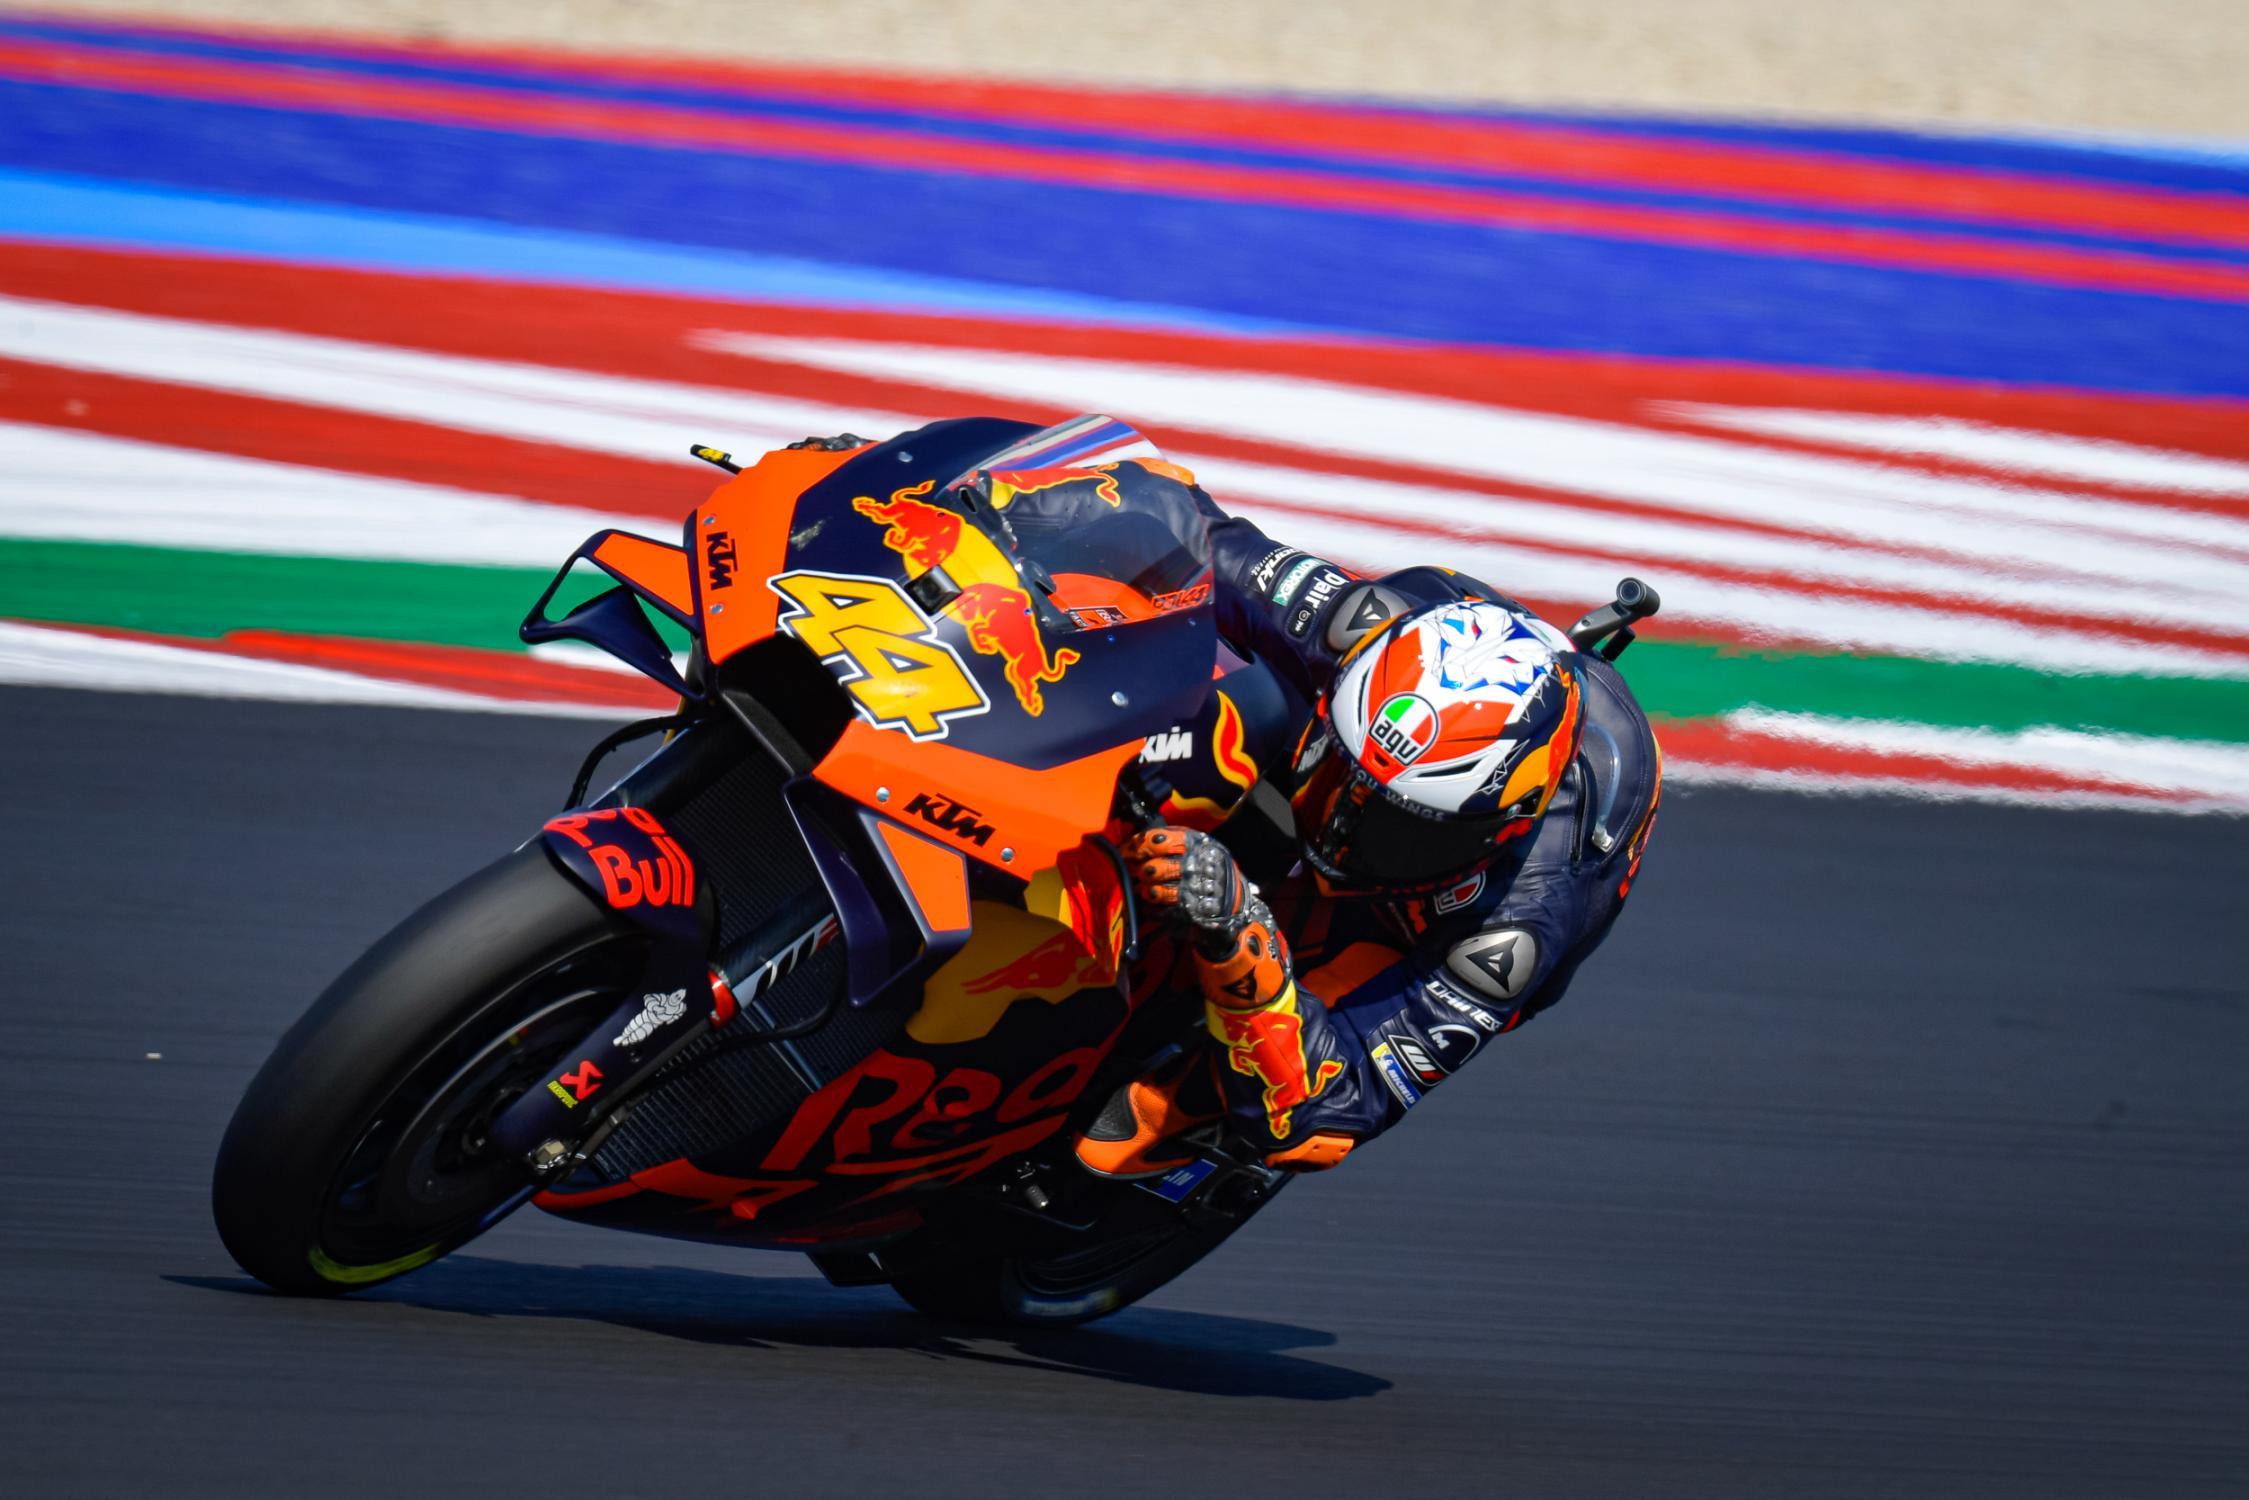 Pol Espargaro, Red Bull KTM MotoGP, Misano 2020